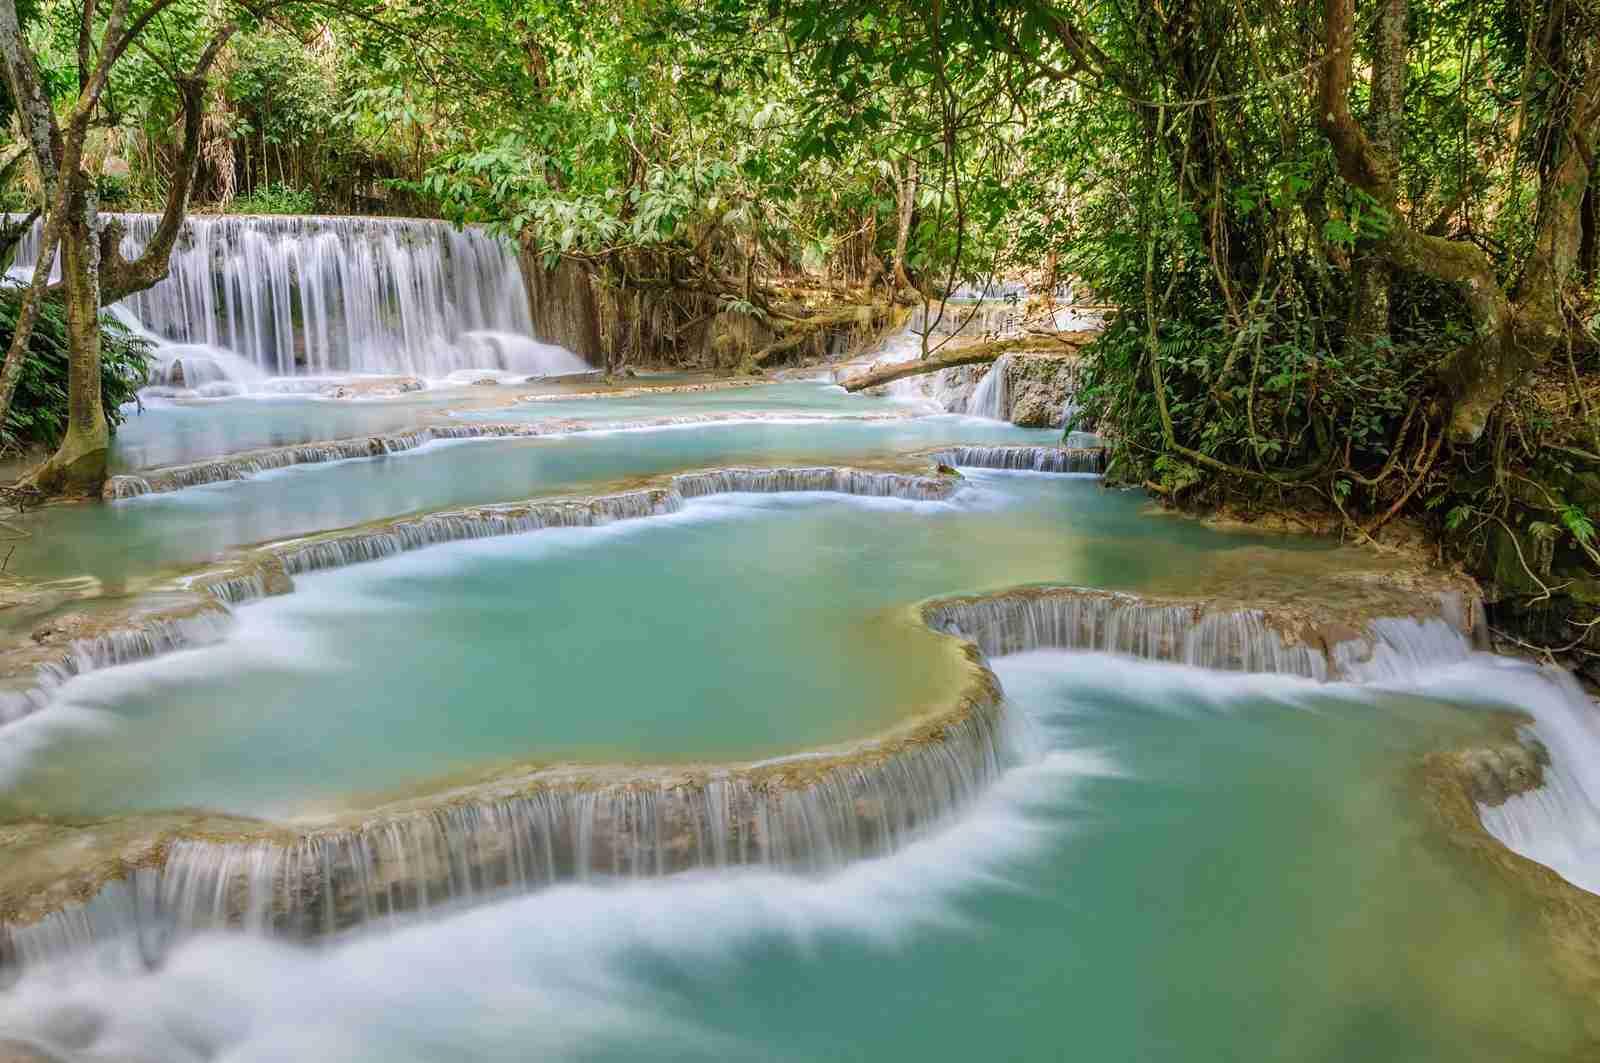 The Kuang Si Falls near Luang Prabang in Laos. (Photo by GorazdBertalanic/Getty Images)